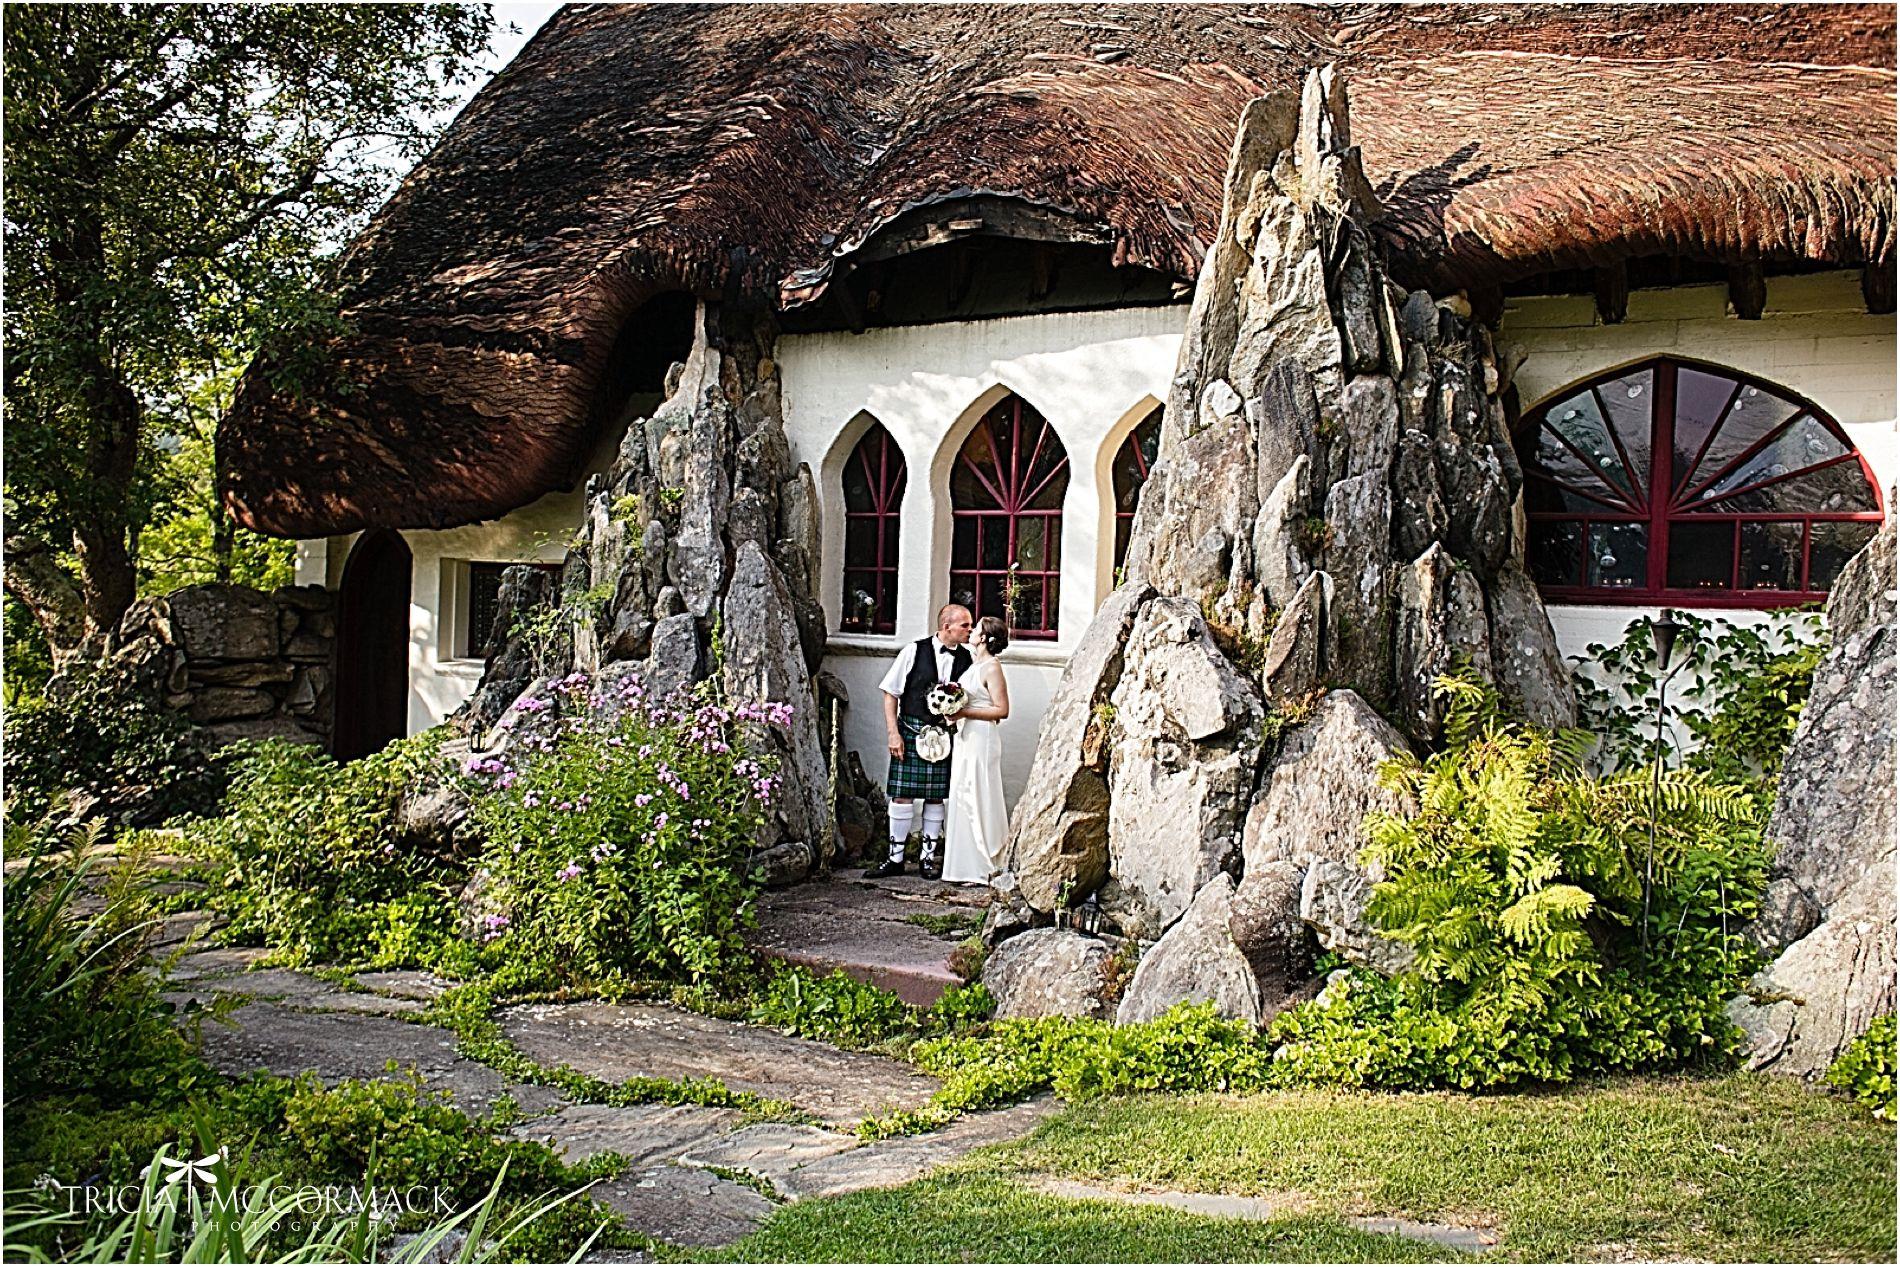 Santarella Aka The Gingerbread House Tyringham MA Great Wedding Location